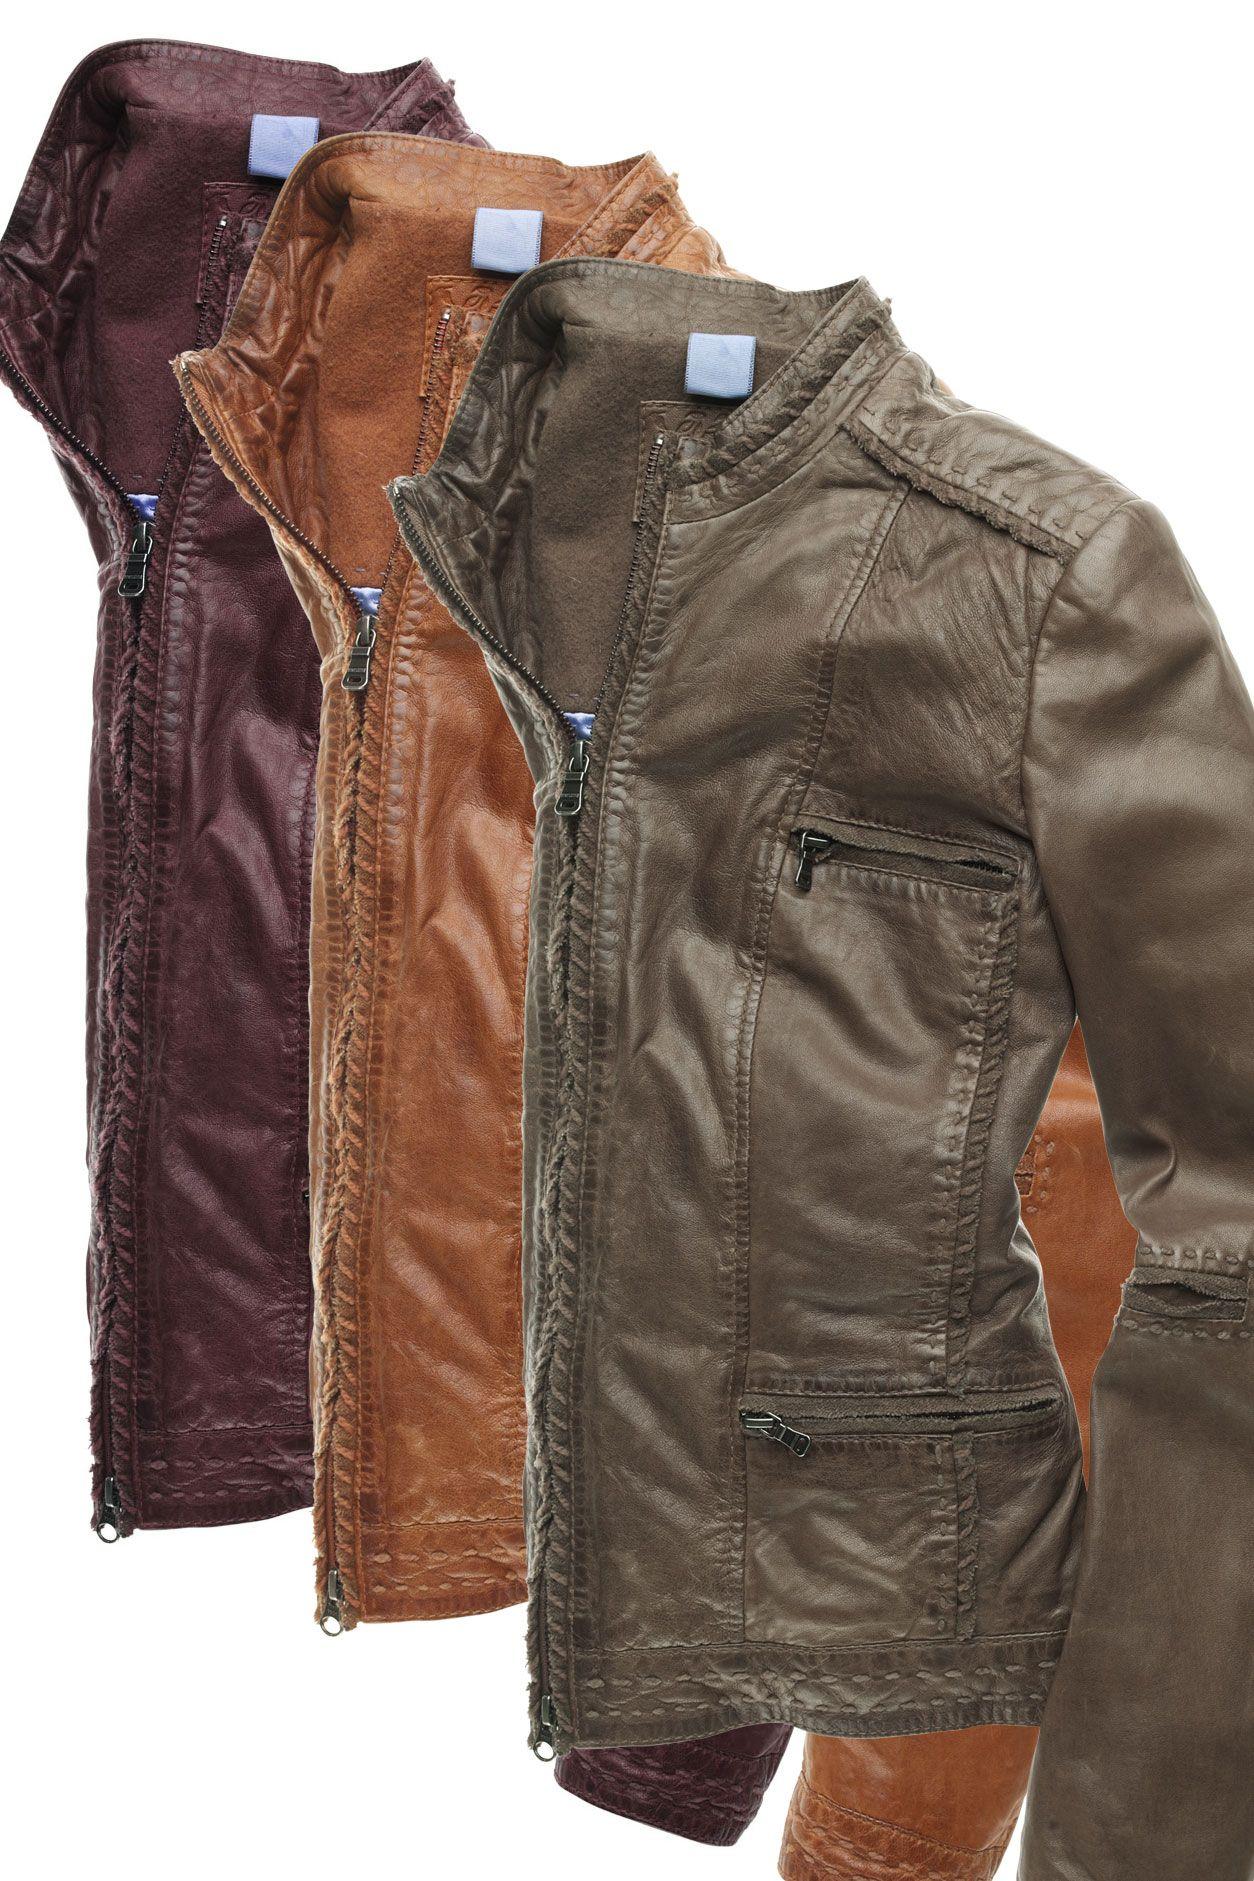 Milestone Coats & Jackets for Men for